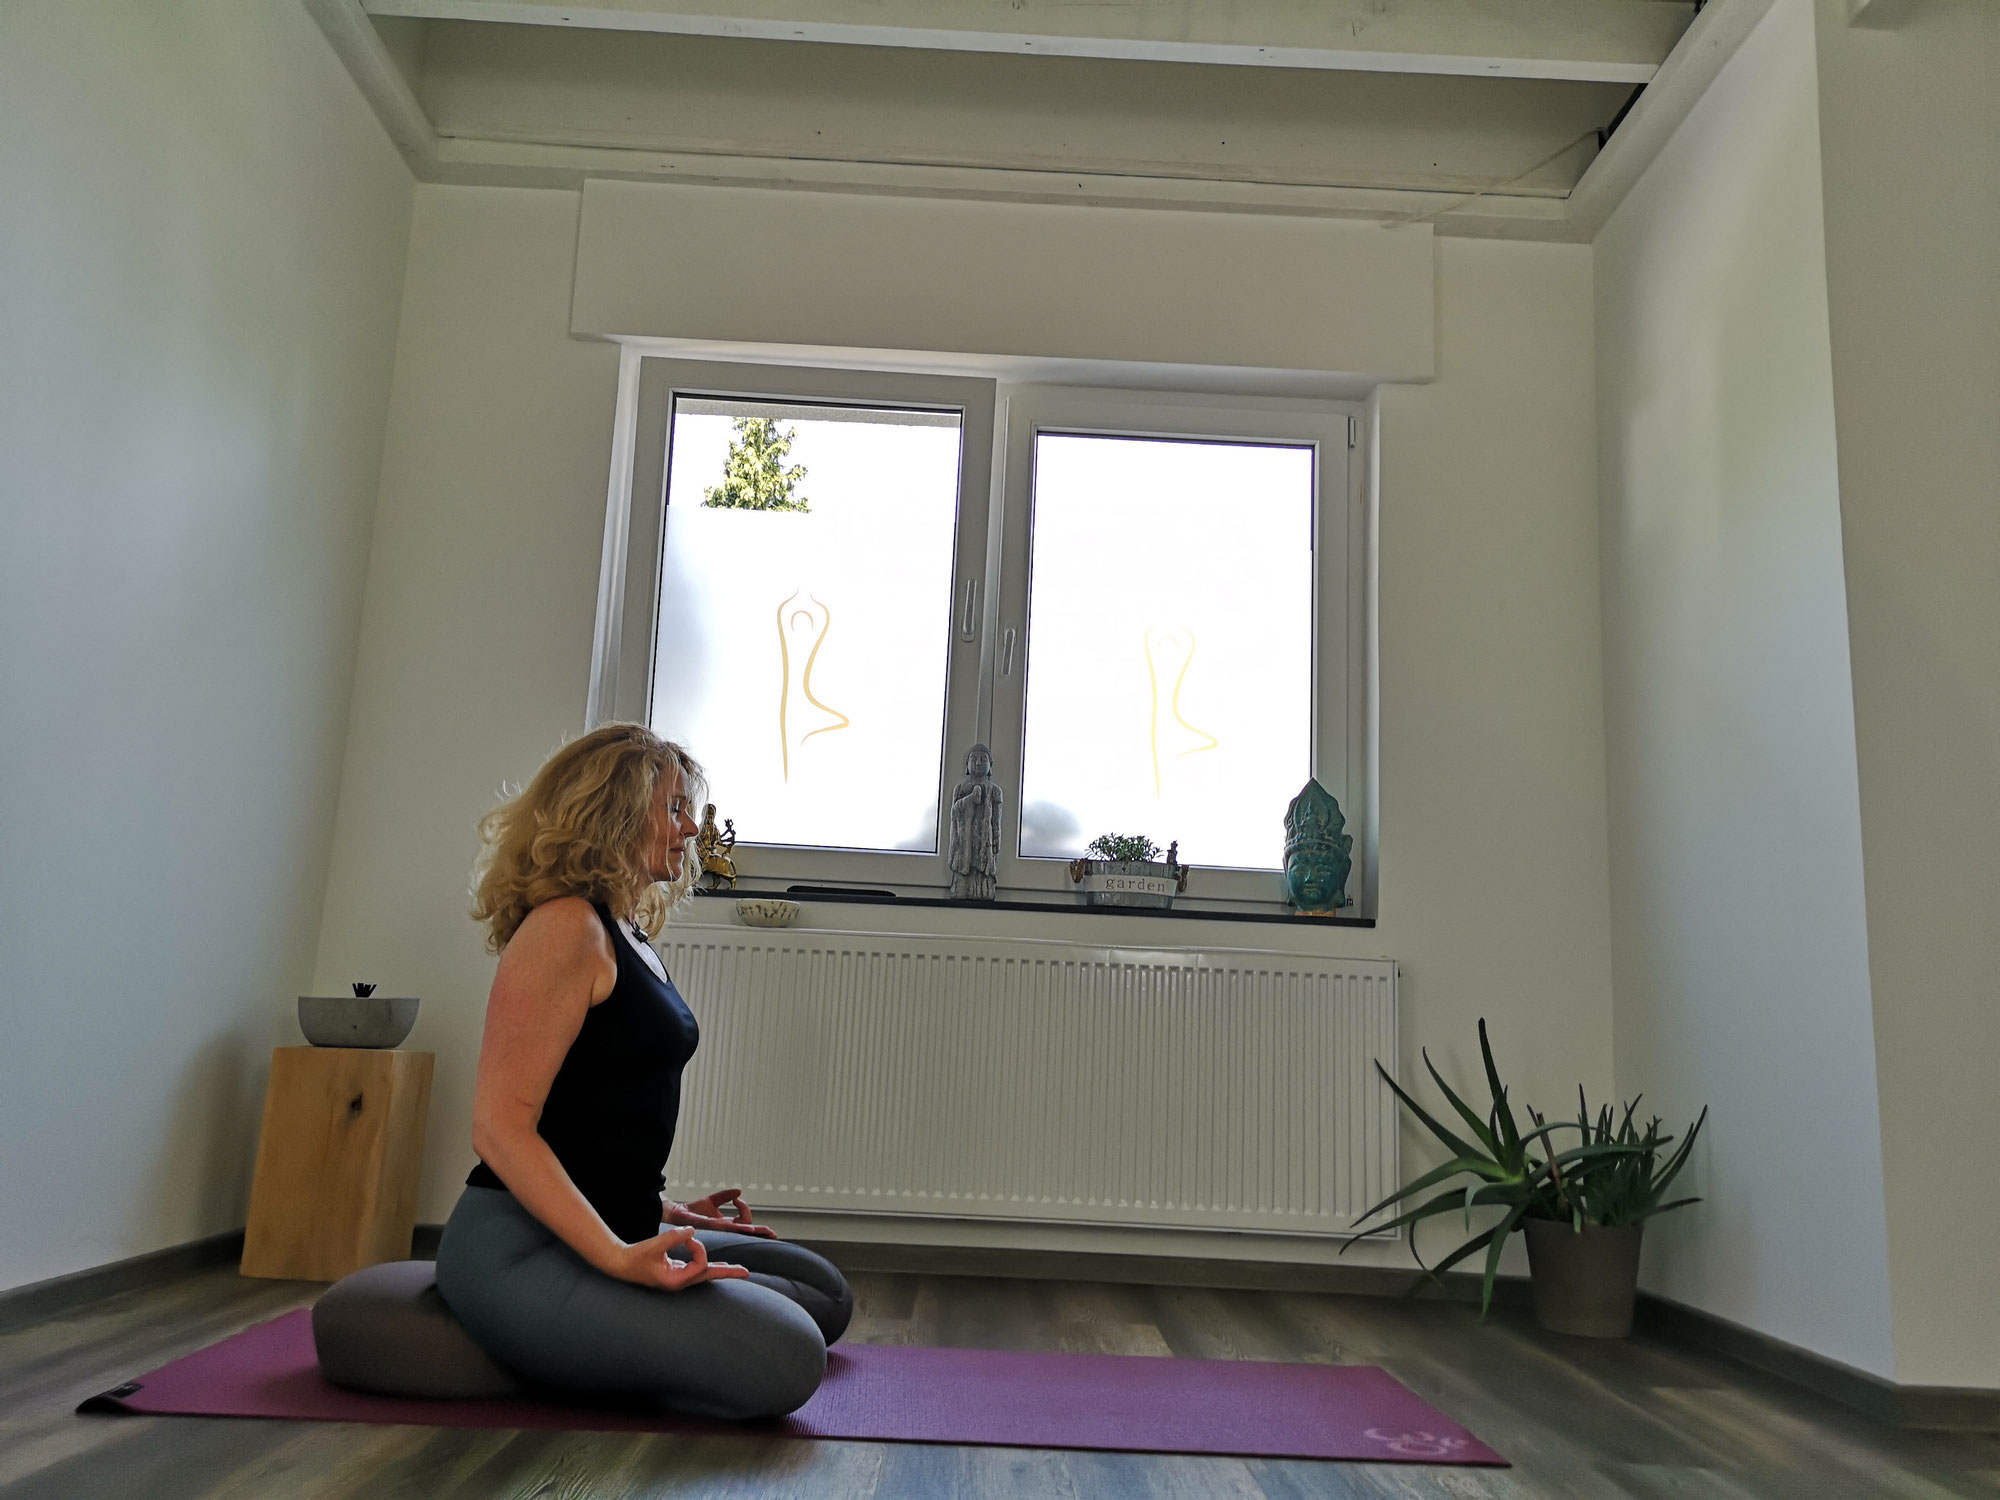 8-Wochen-Achtsamkeitskurs – Living Mindfulness mit Kerstin